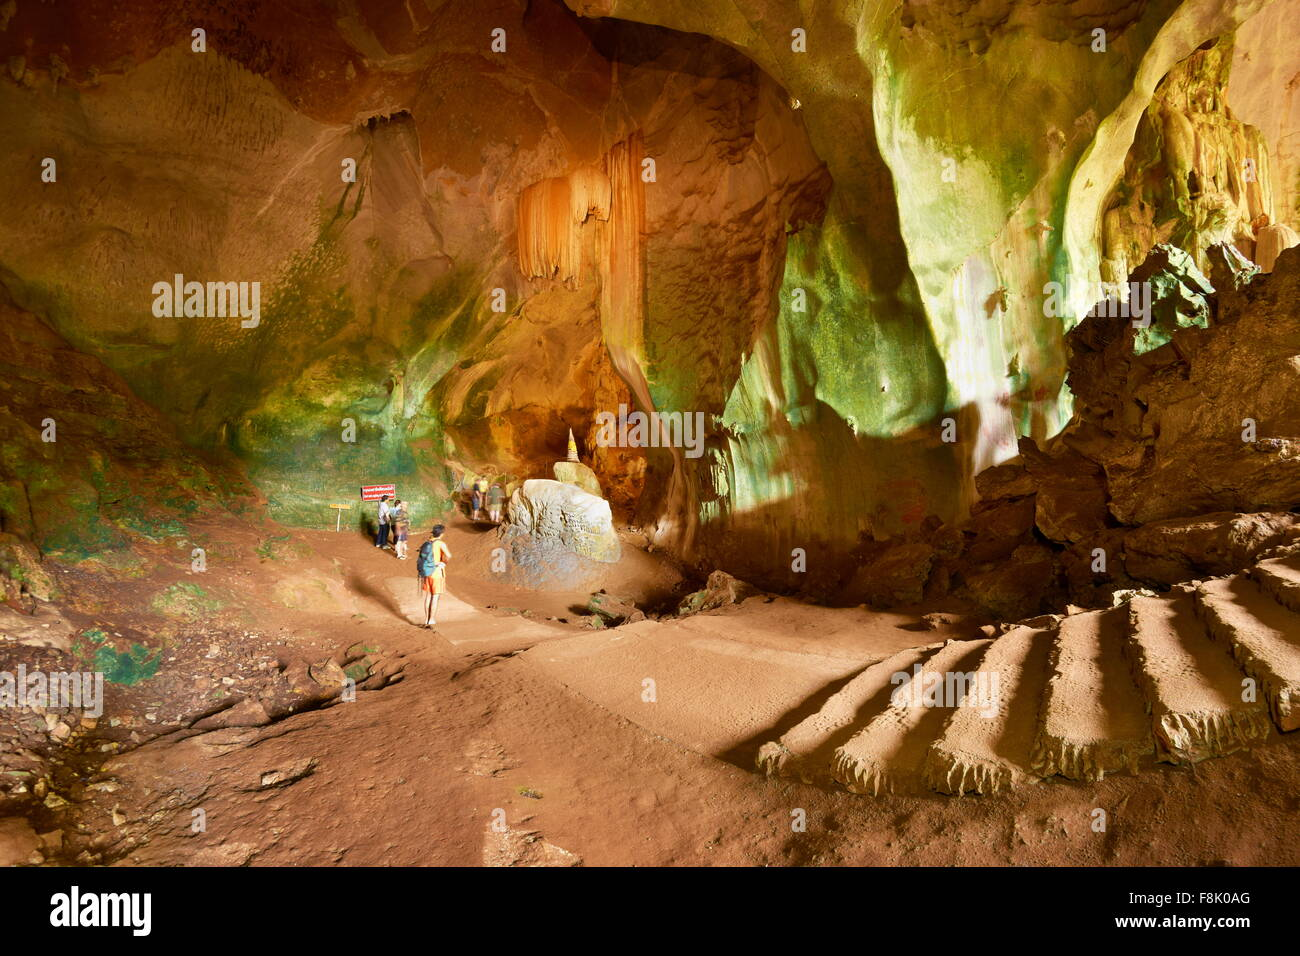 Thailand - Phang Nga Province, Wat Suwan Kuha Cave Temple - Stock Image